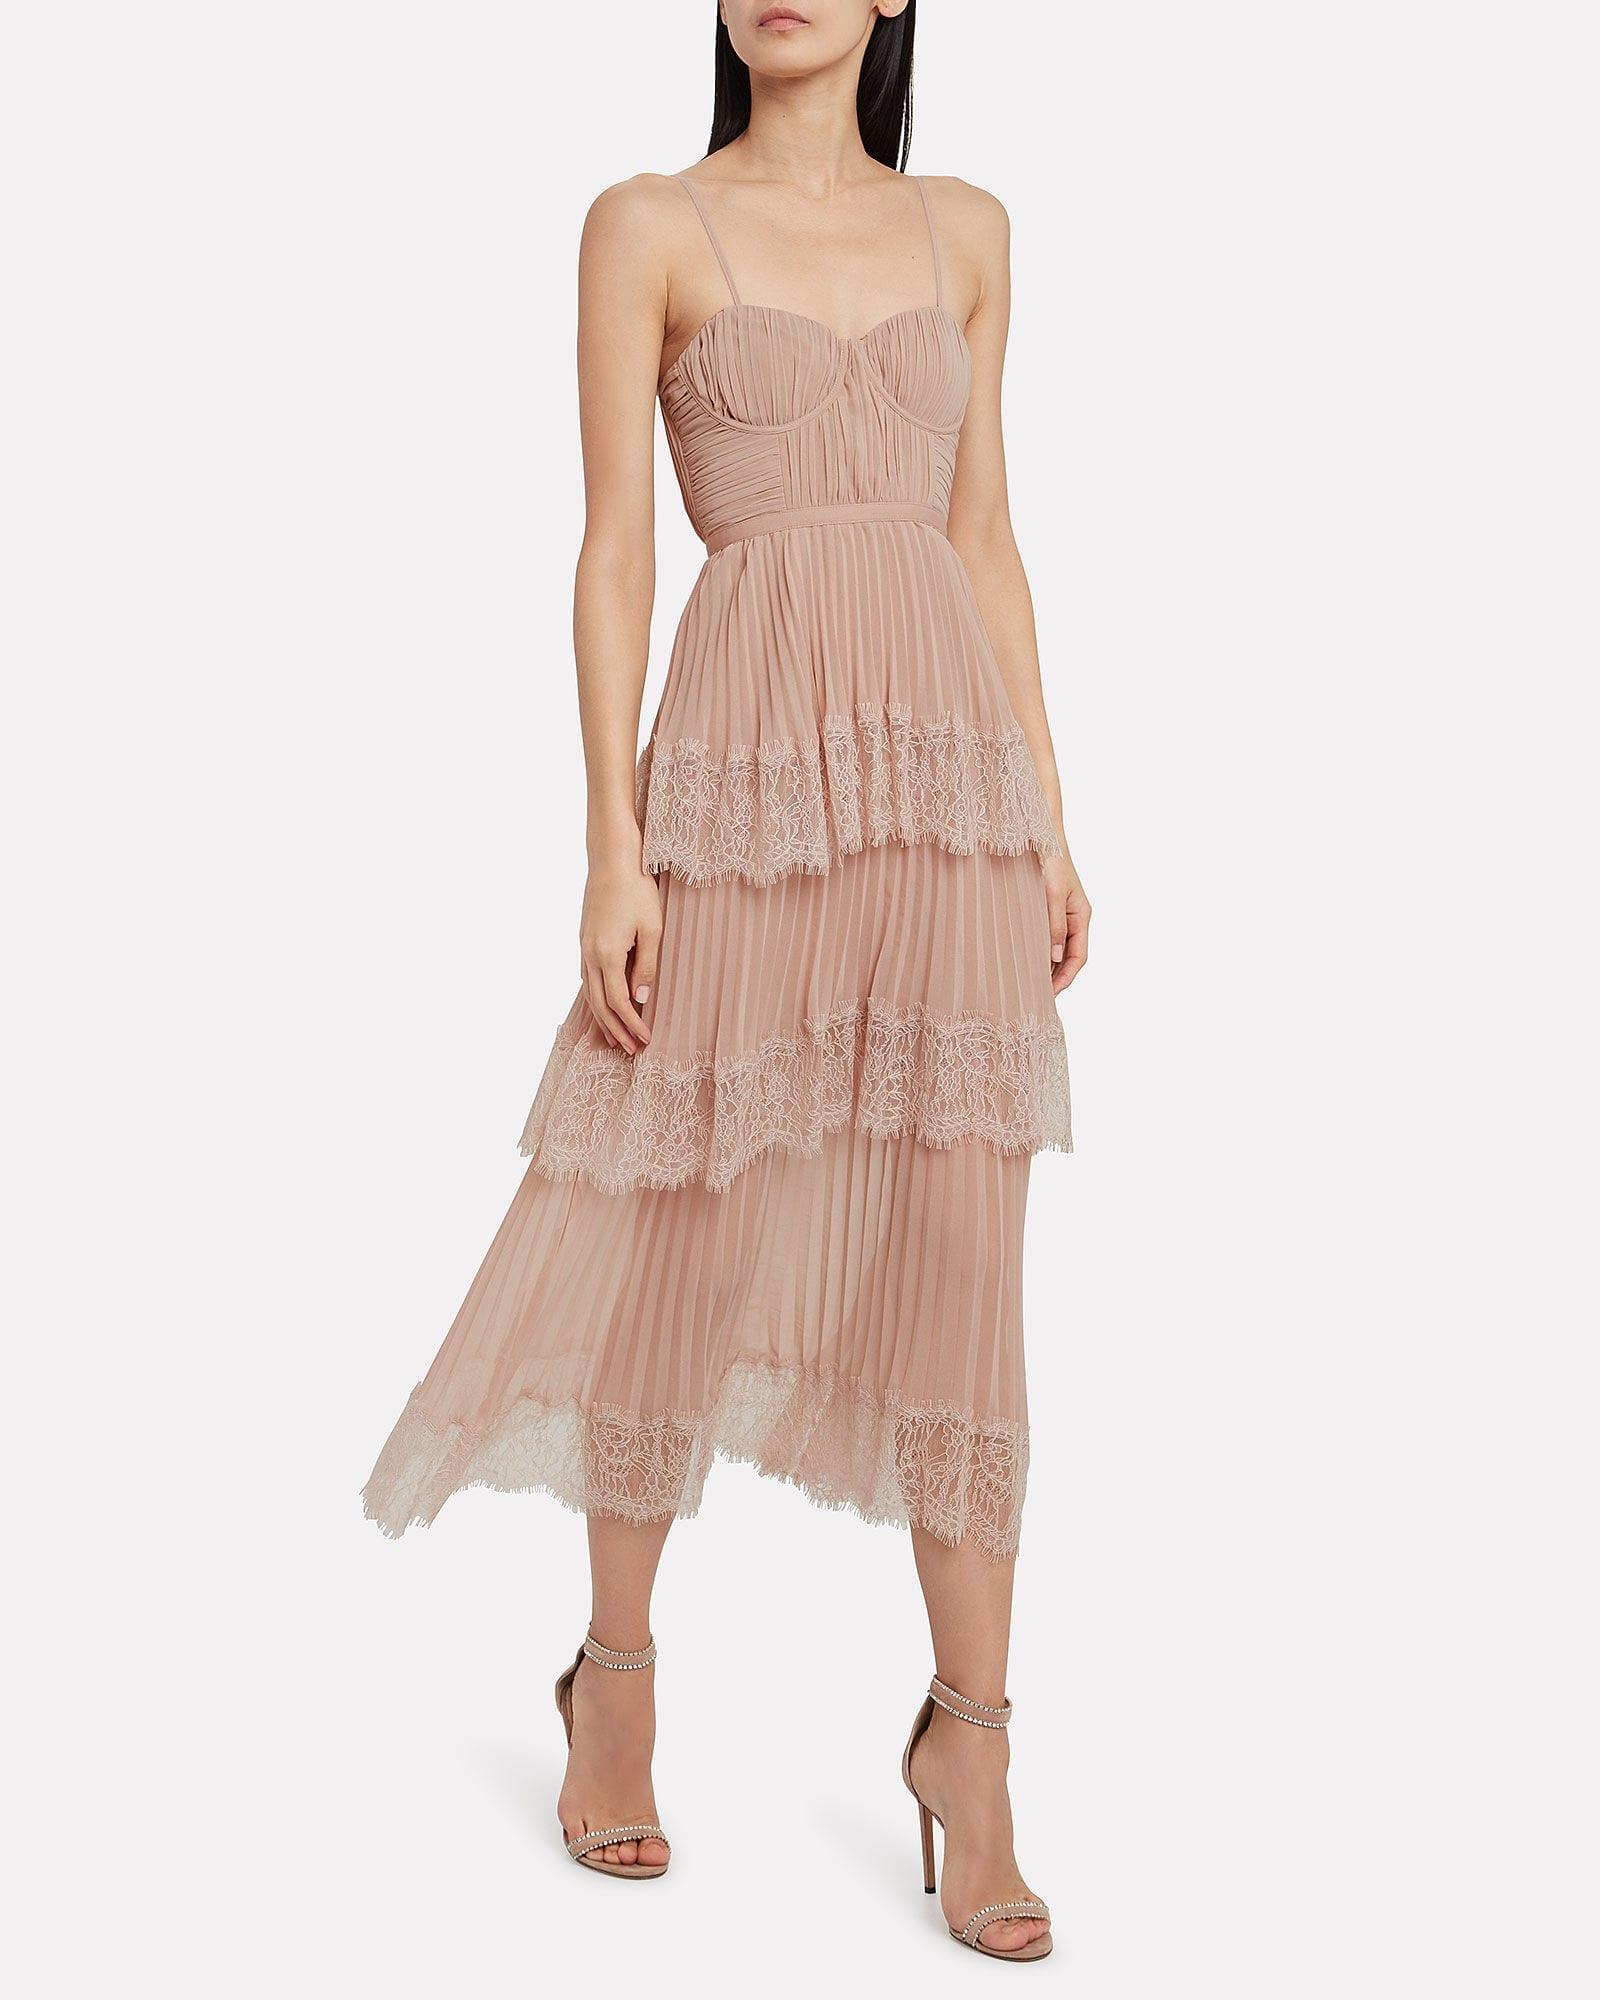 SELF-PORTRAIT Chiffon Lace-Trimmed Midi Dress